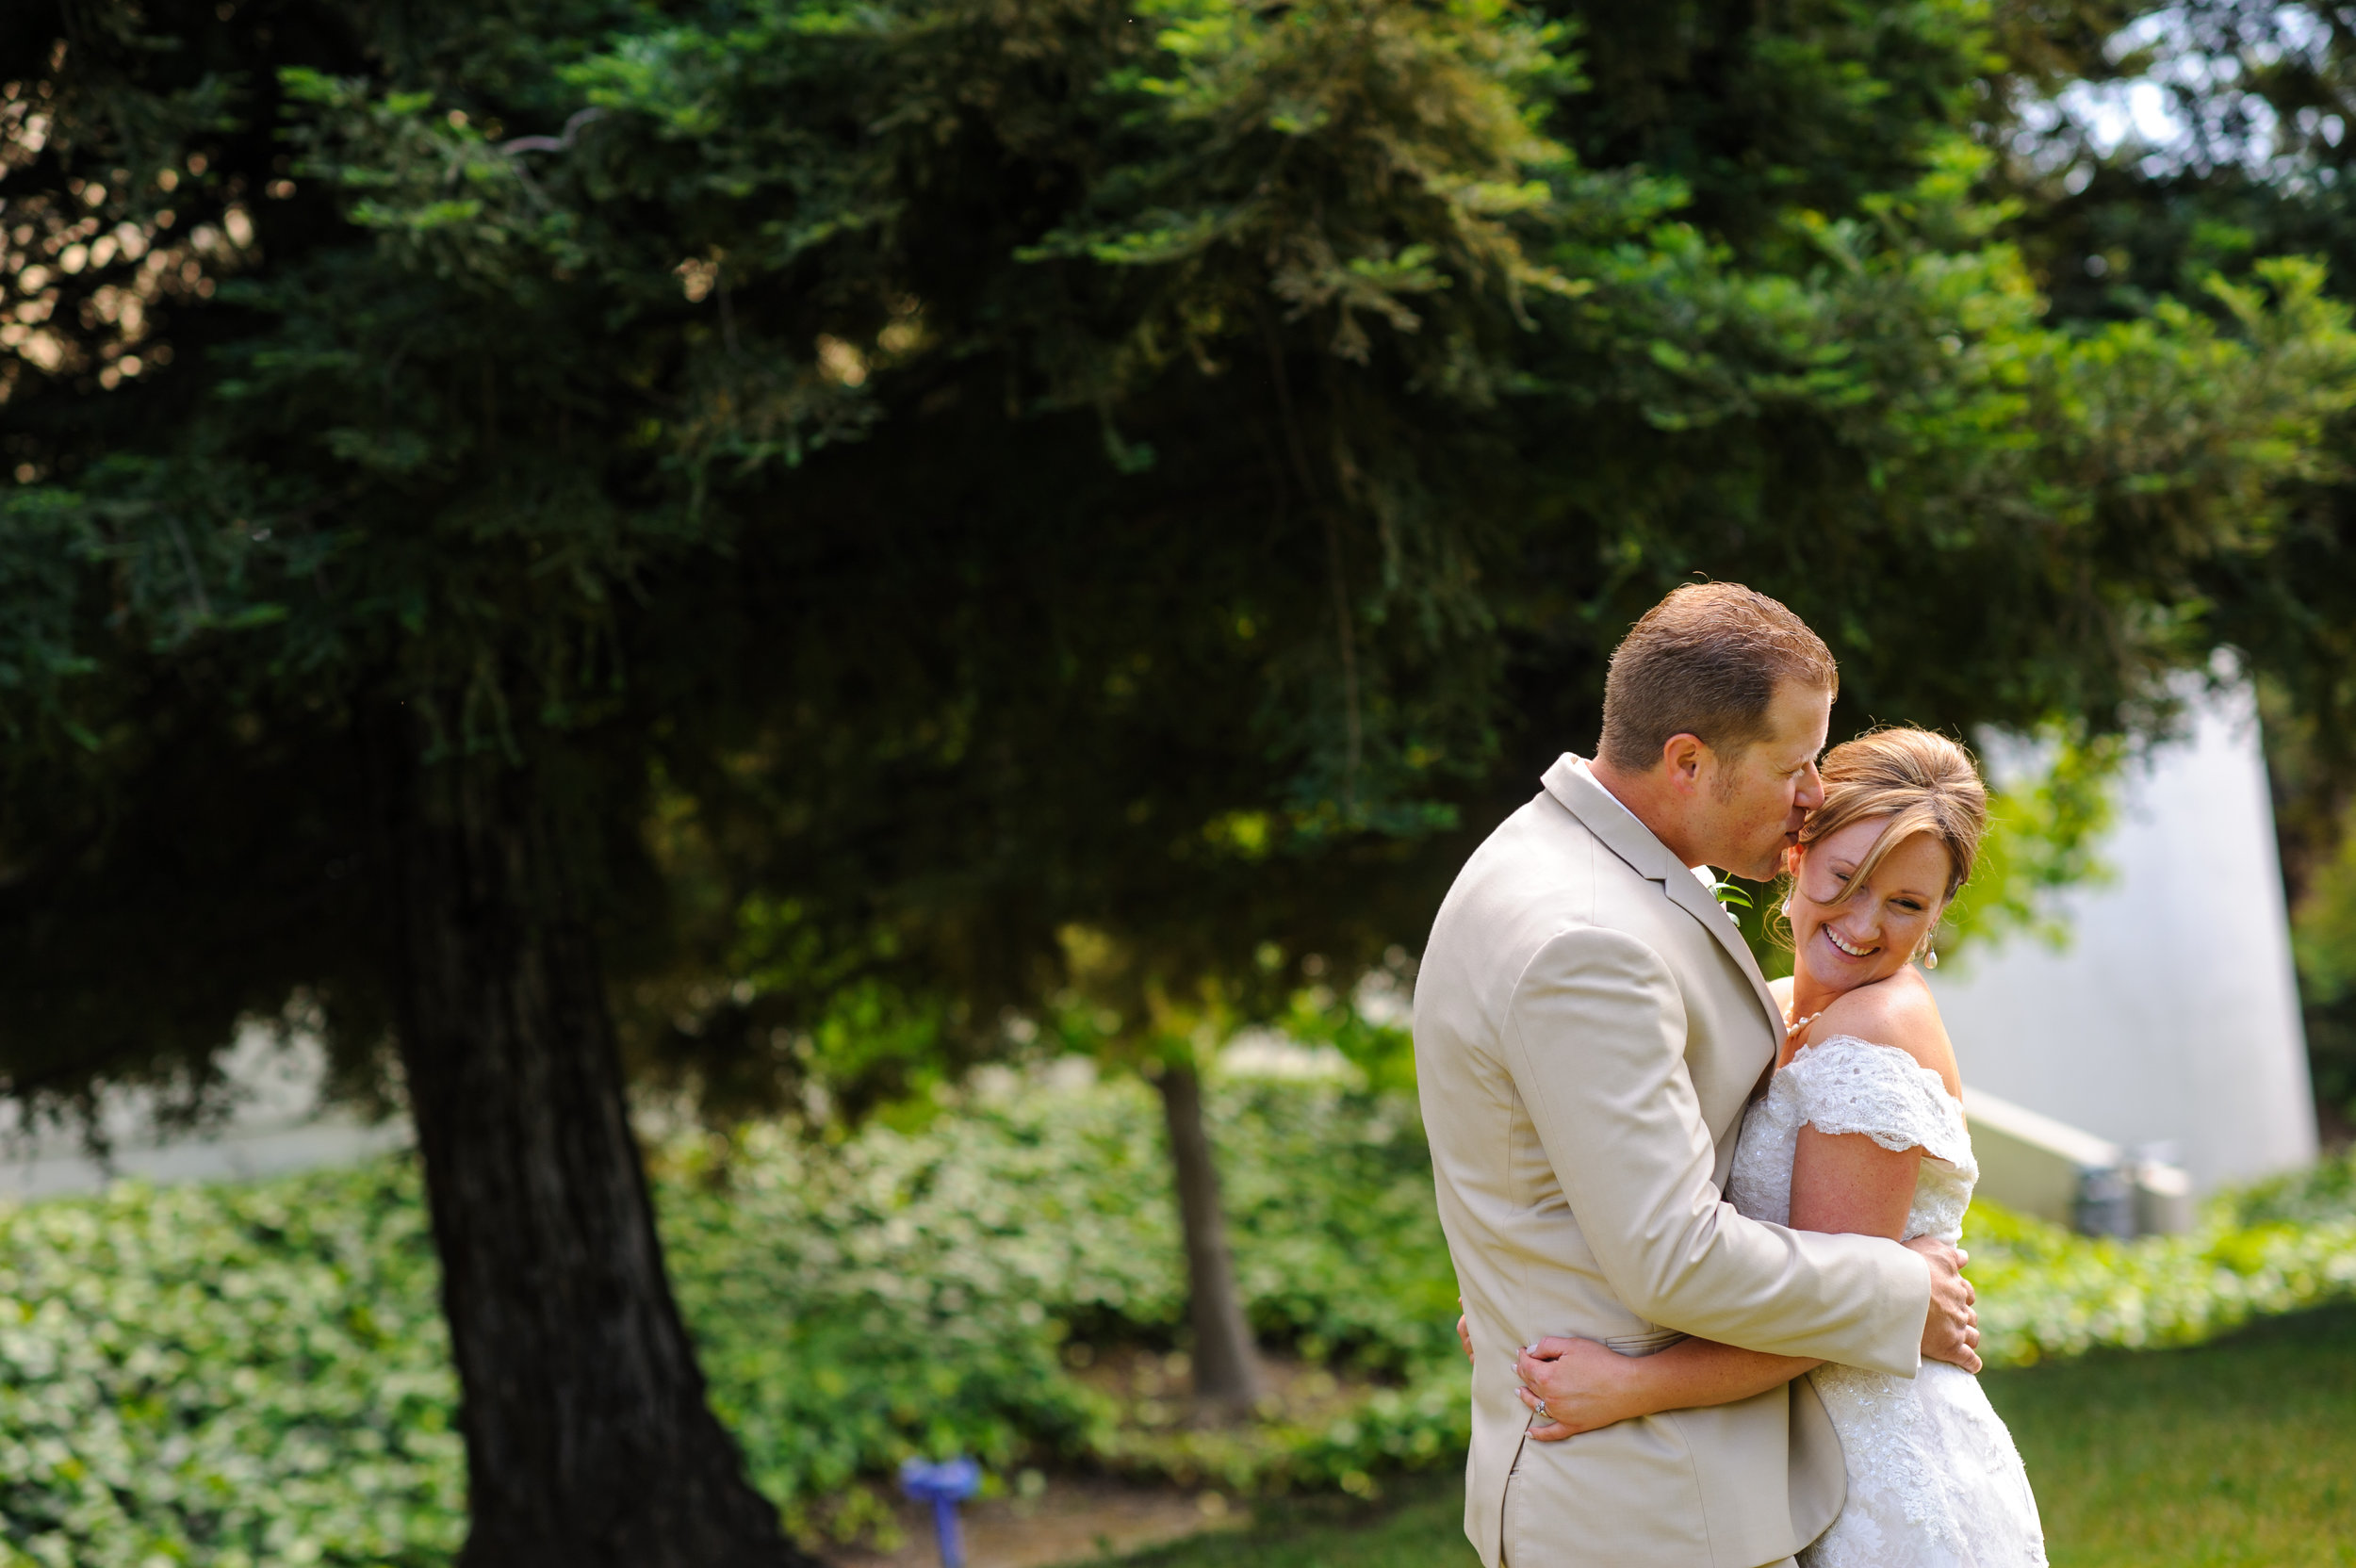 danielle-ross-015-sacramento-wedding-photographer-katherine-nicole-photography.JPG